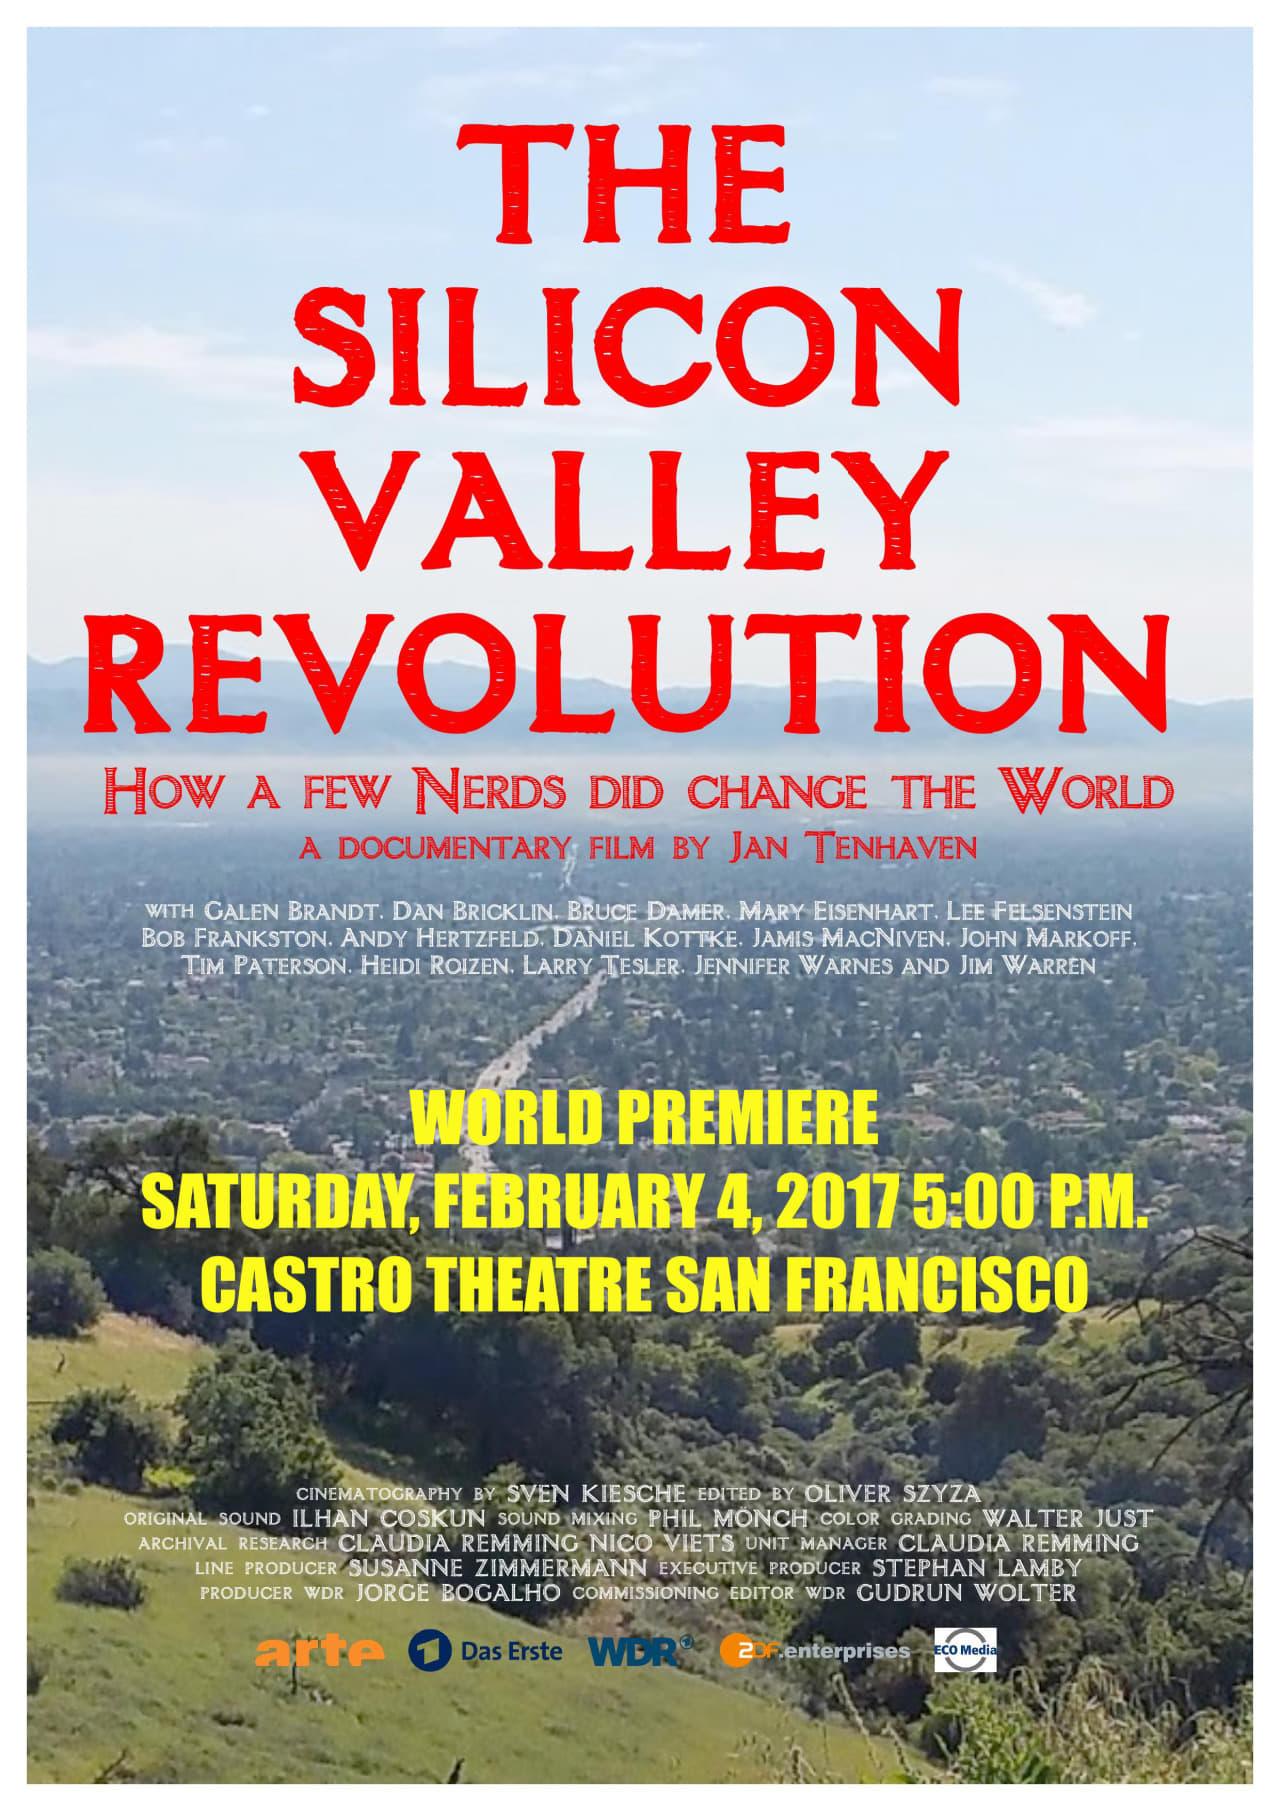 SILICON VALLEY REVOLUTION